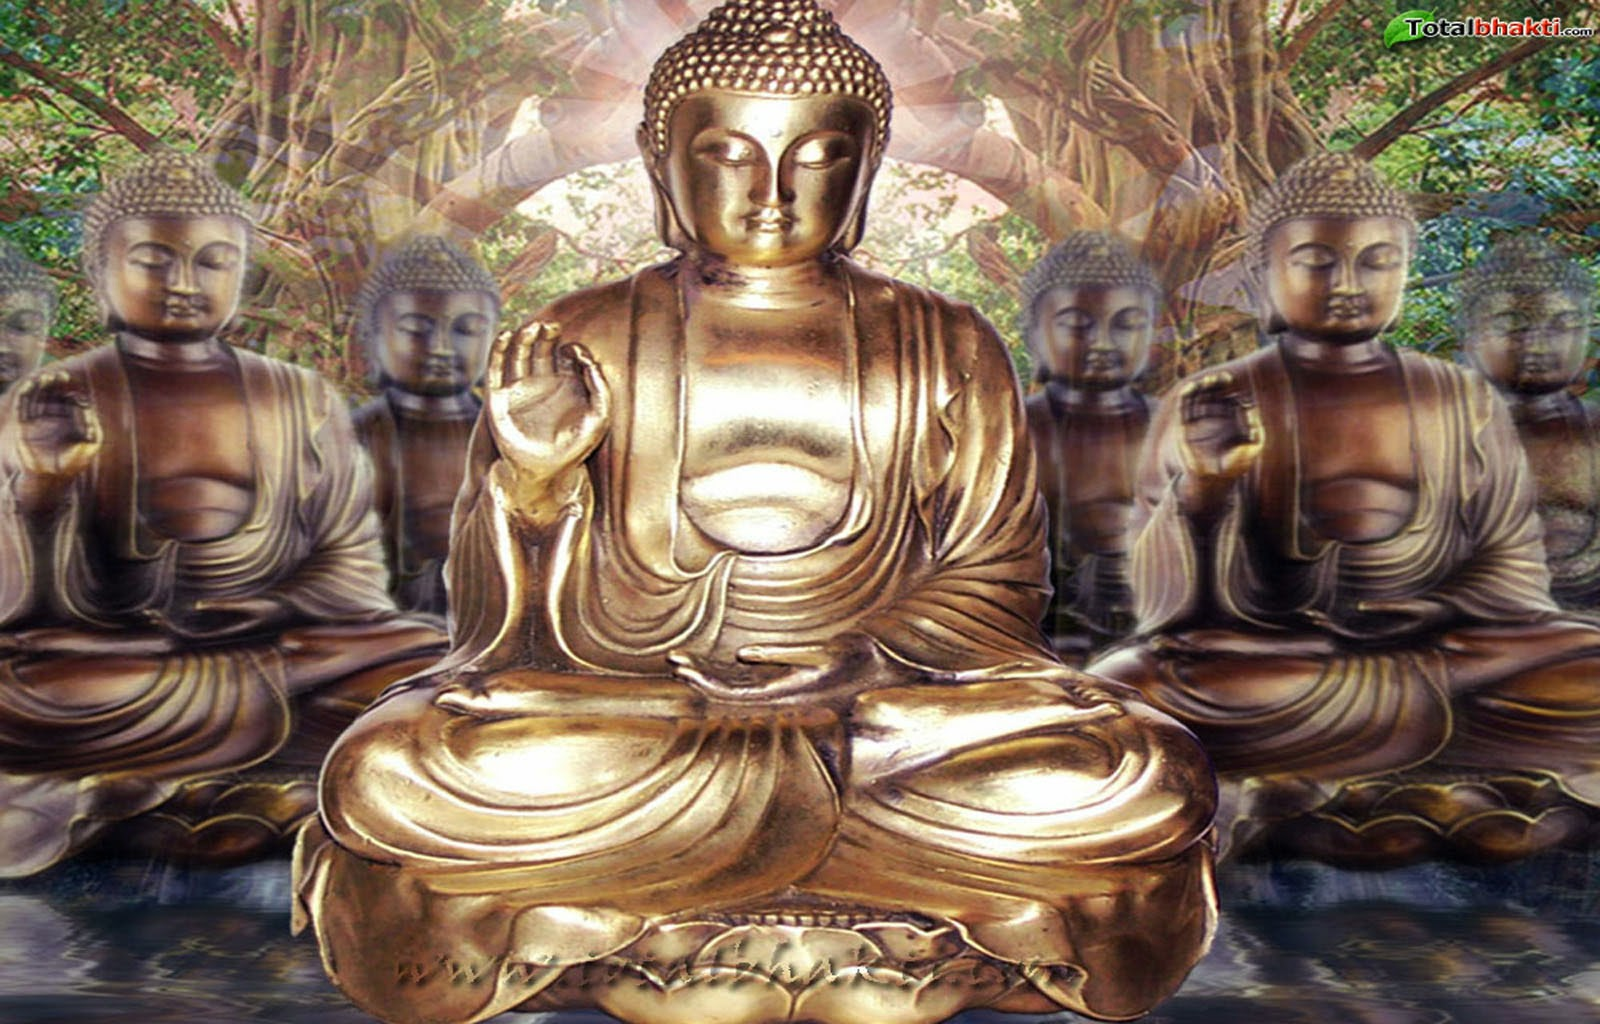 Lord Krishna Wallpaper Full Hd Bhagwan Ji Help Me Lord Gautam Buddha Wallpapers Gallery